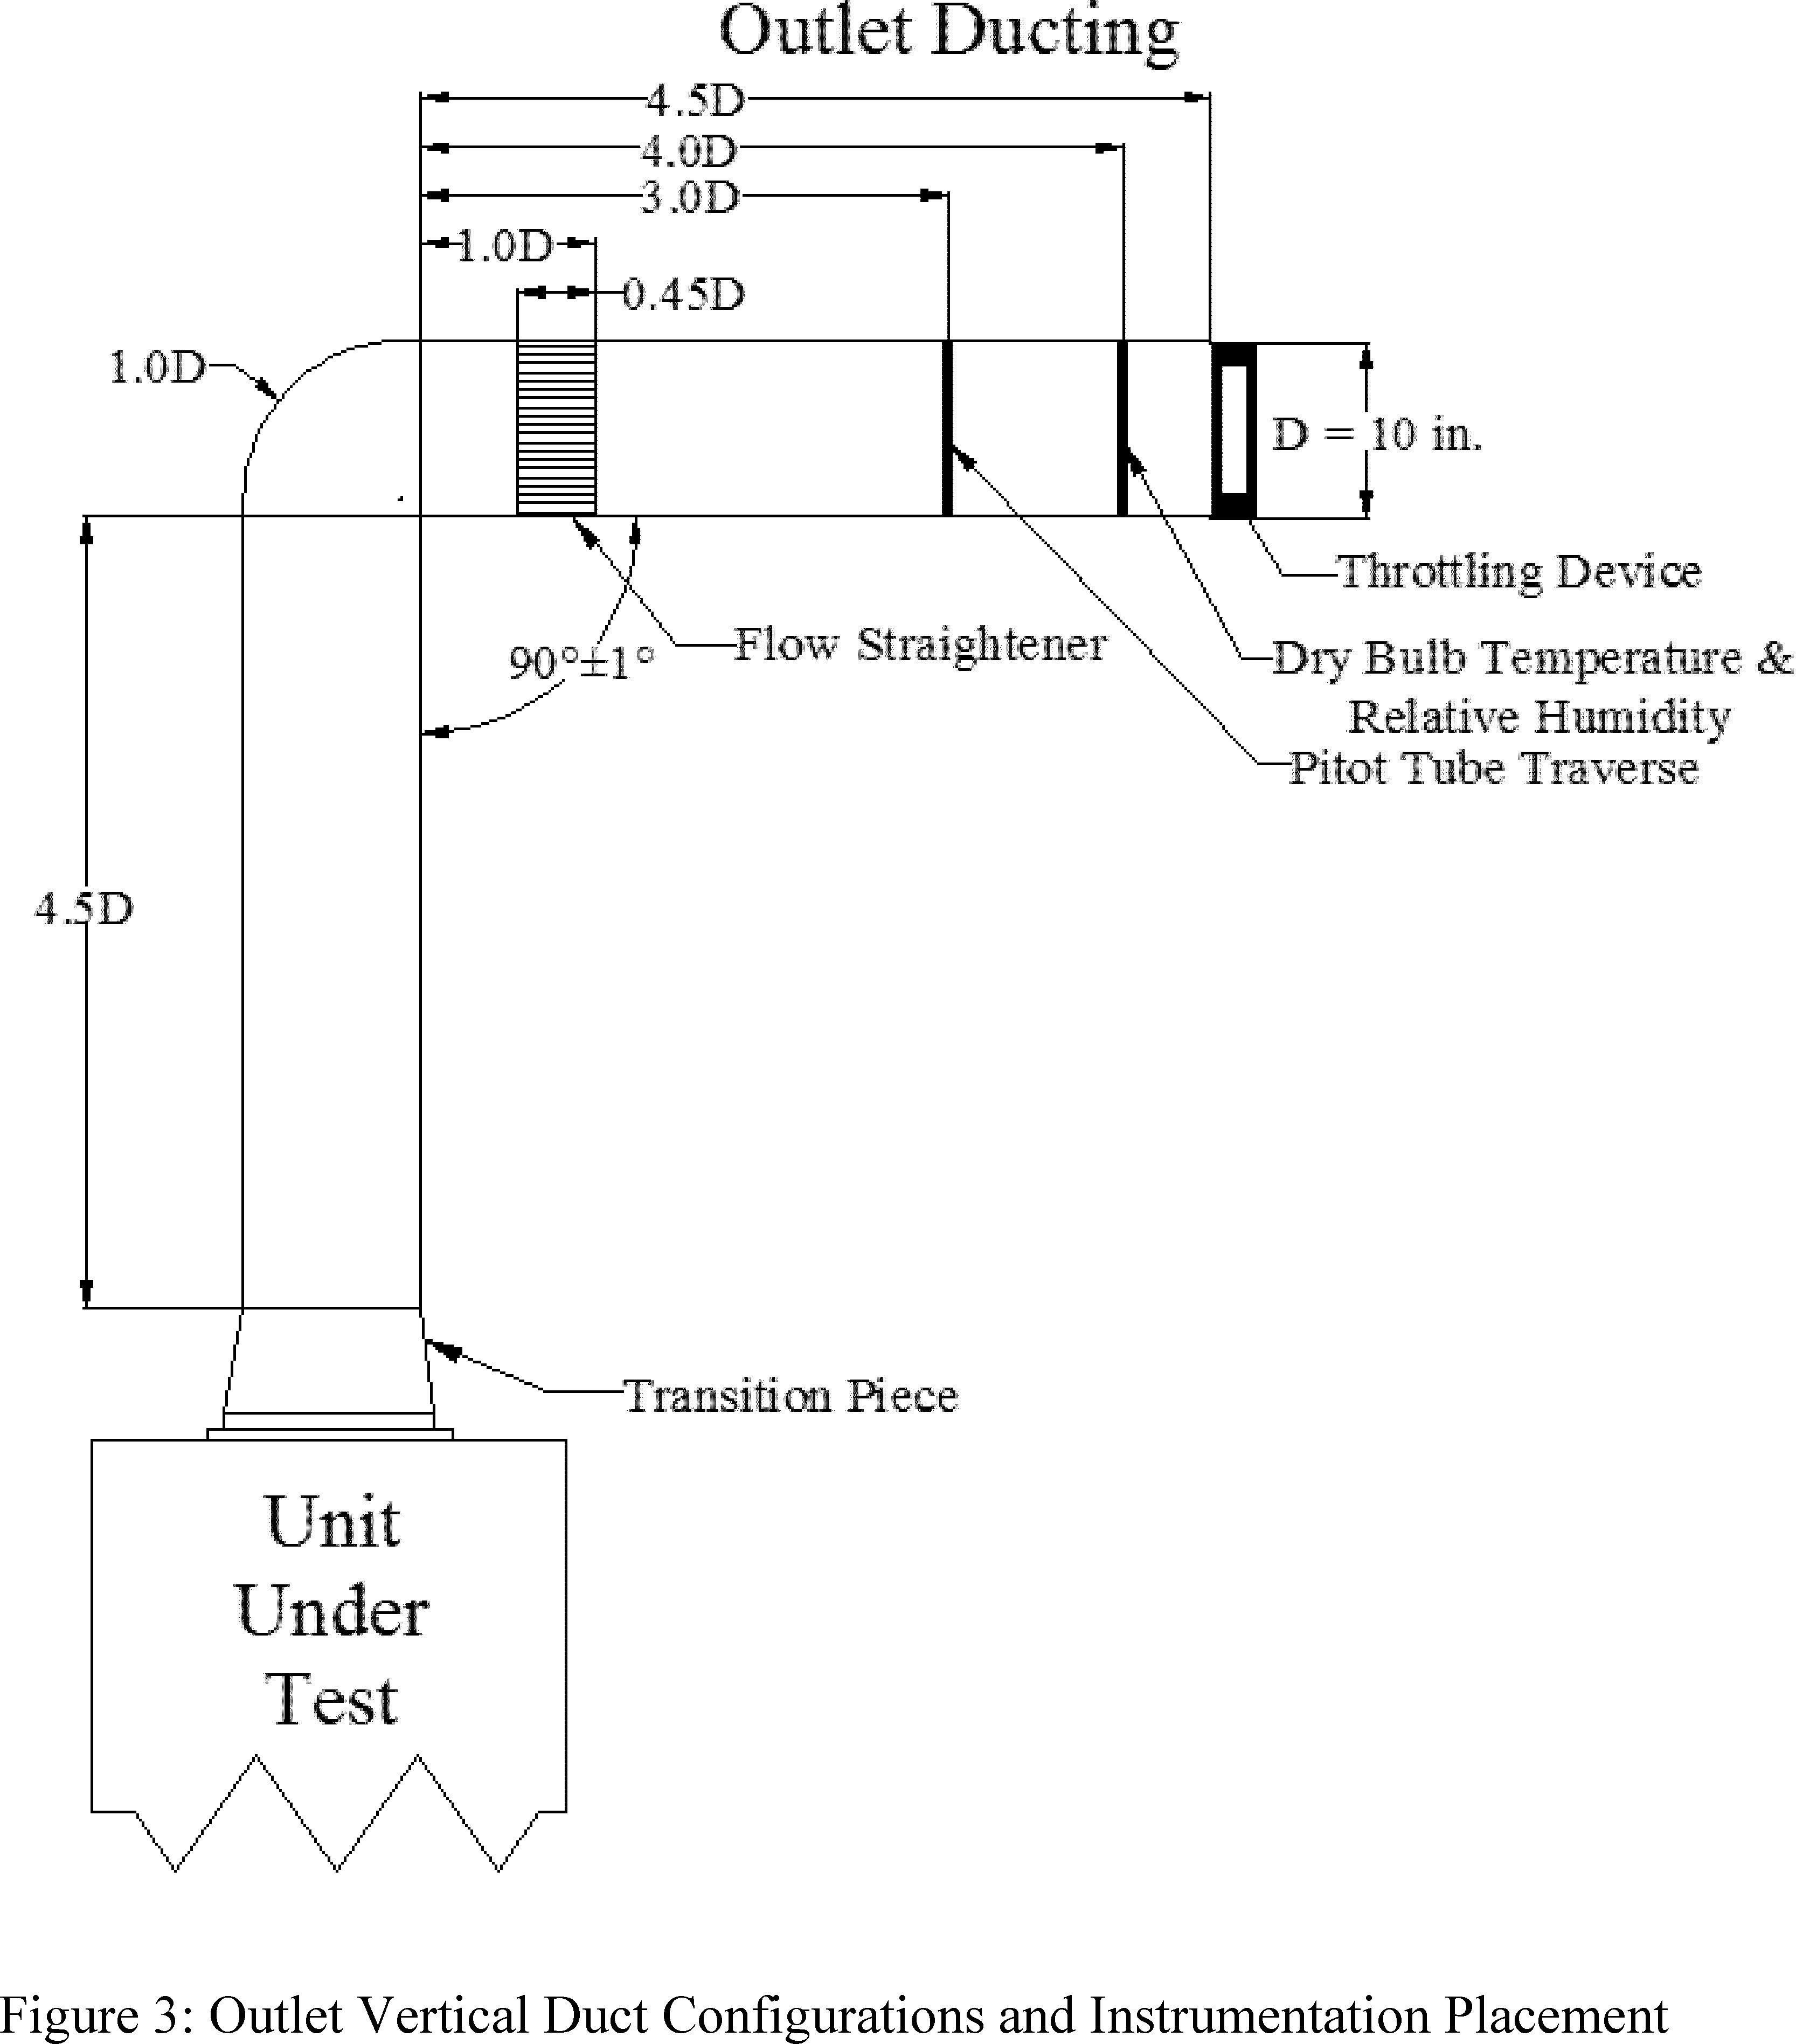 Fluorescent Light Fixture Parts Diagram Wiring Lights Parallel Diagram Schematics Wiring Diagrams • Of Fluorescent Light Fixture Parts Diagram